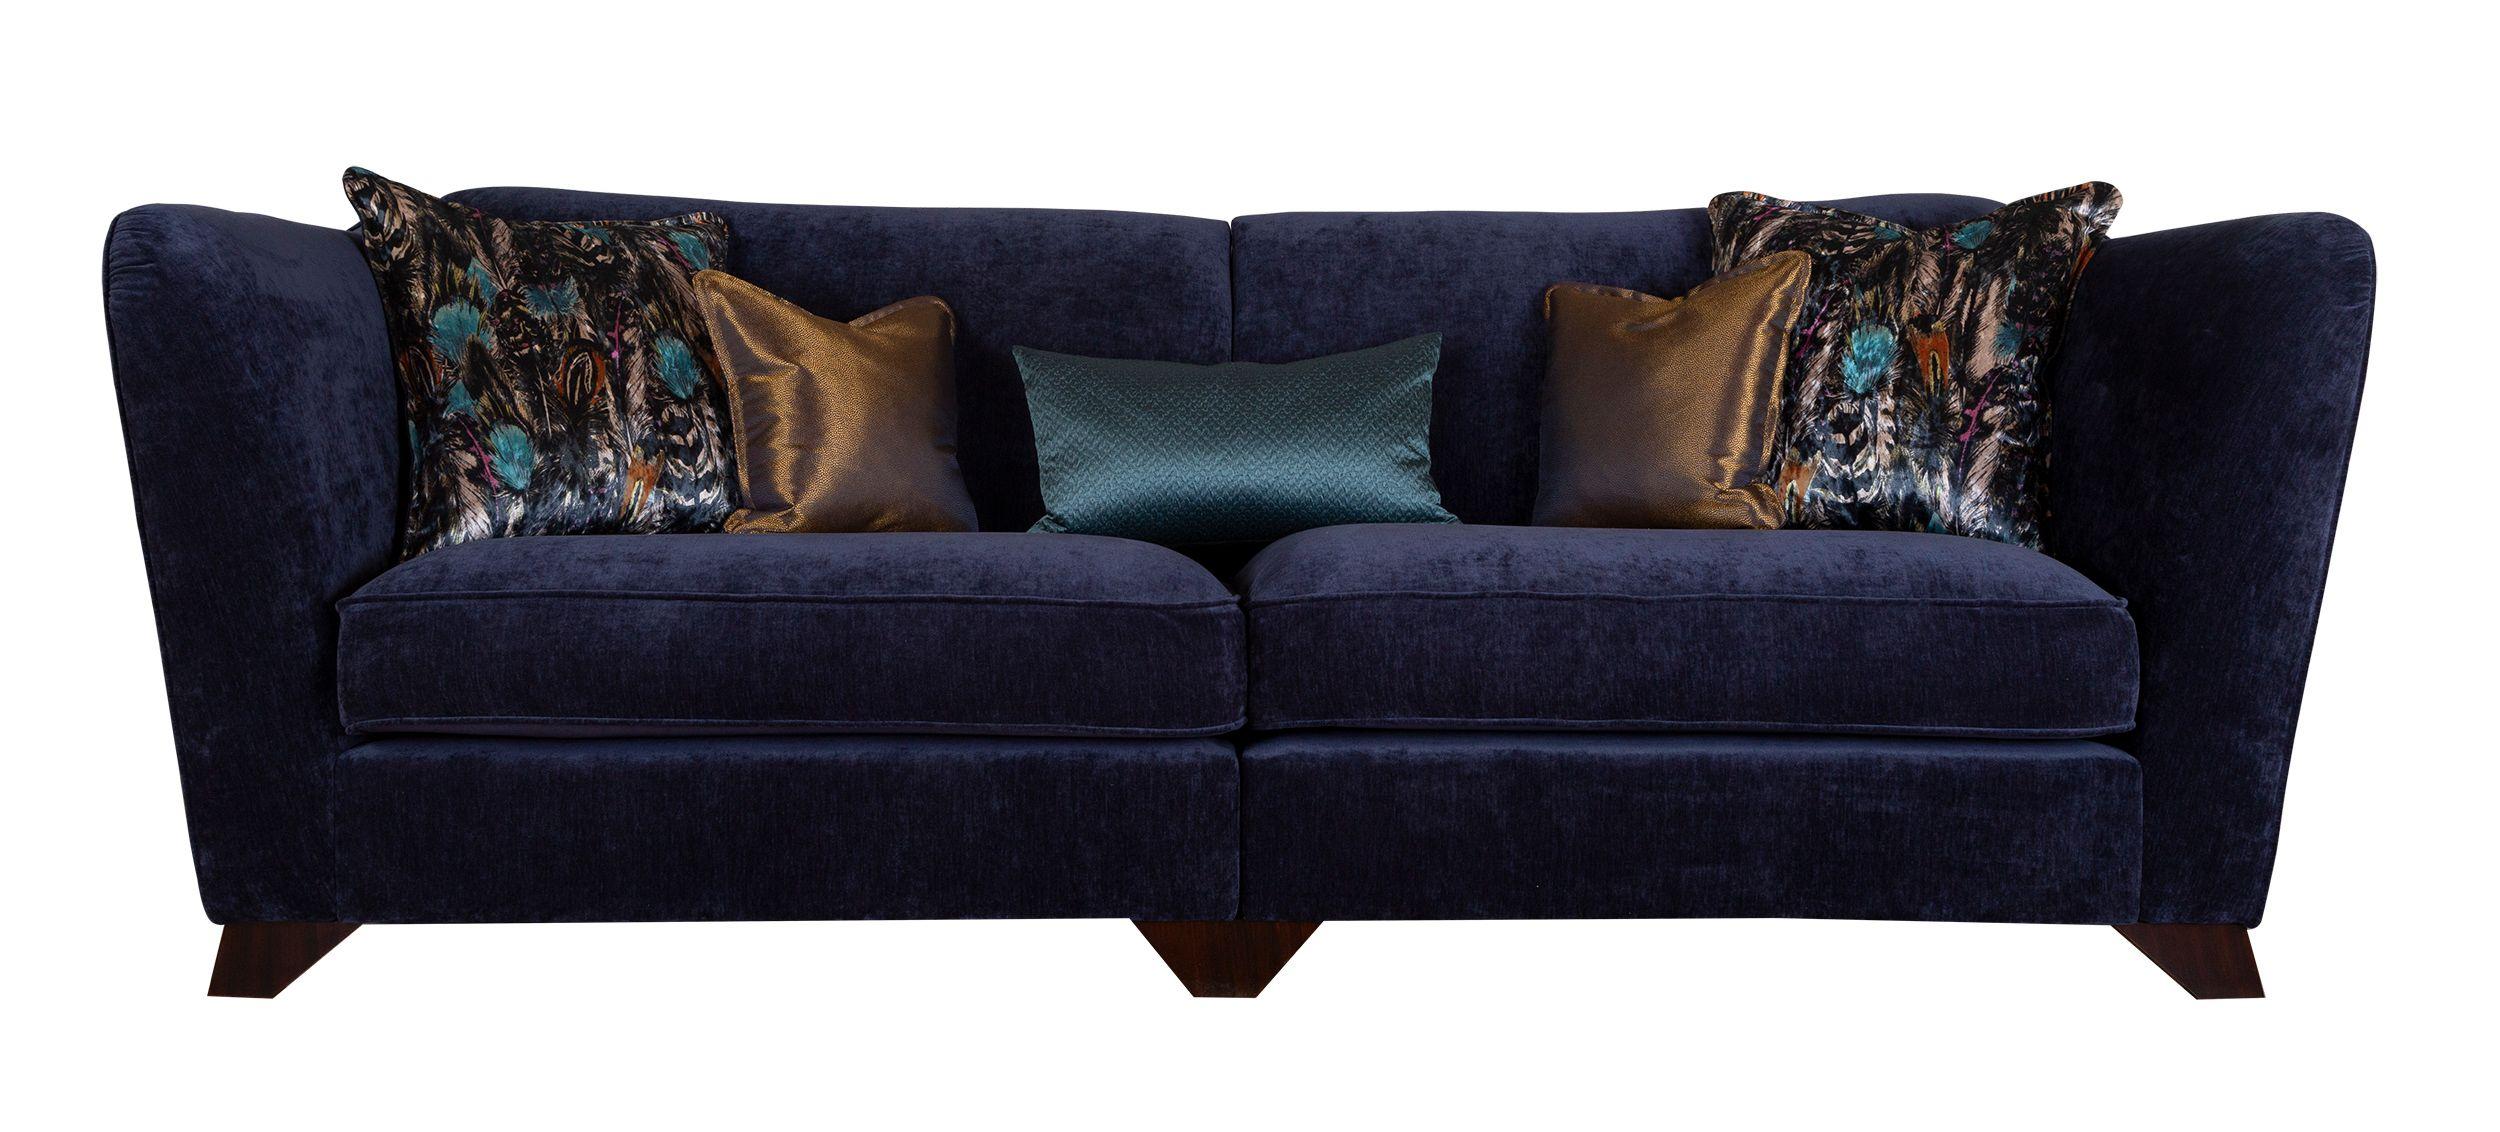 The Royal 4 Seater Modular Sofa